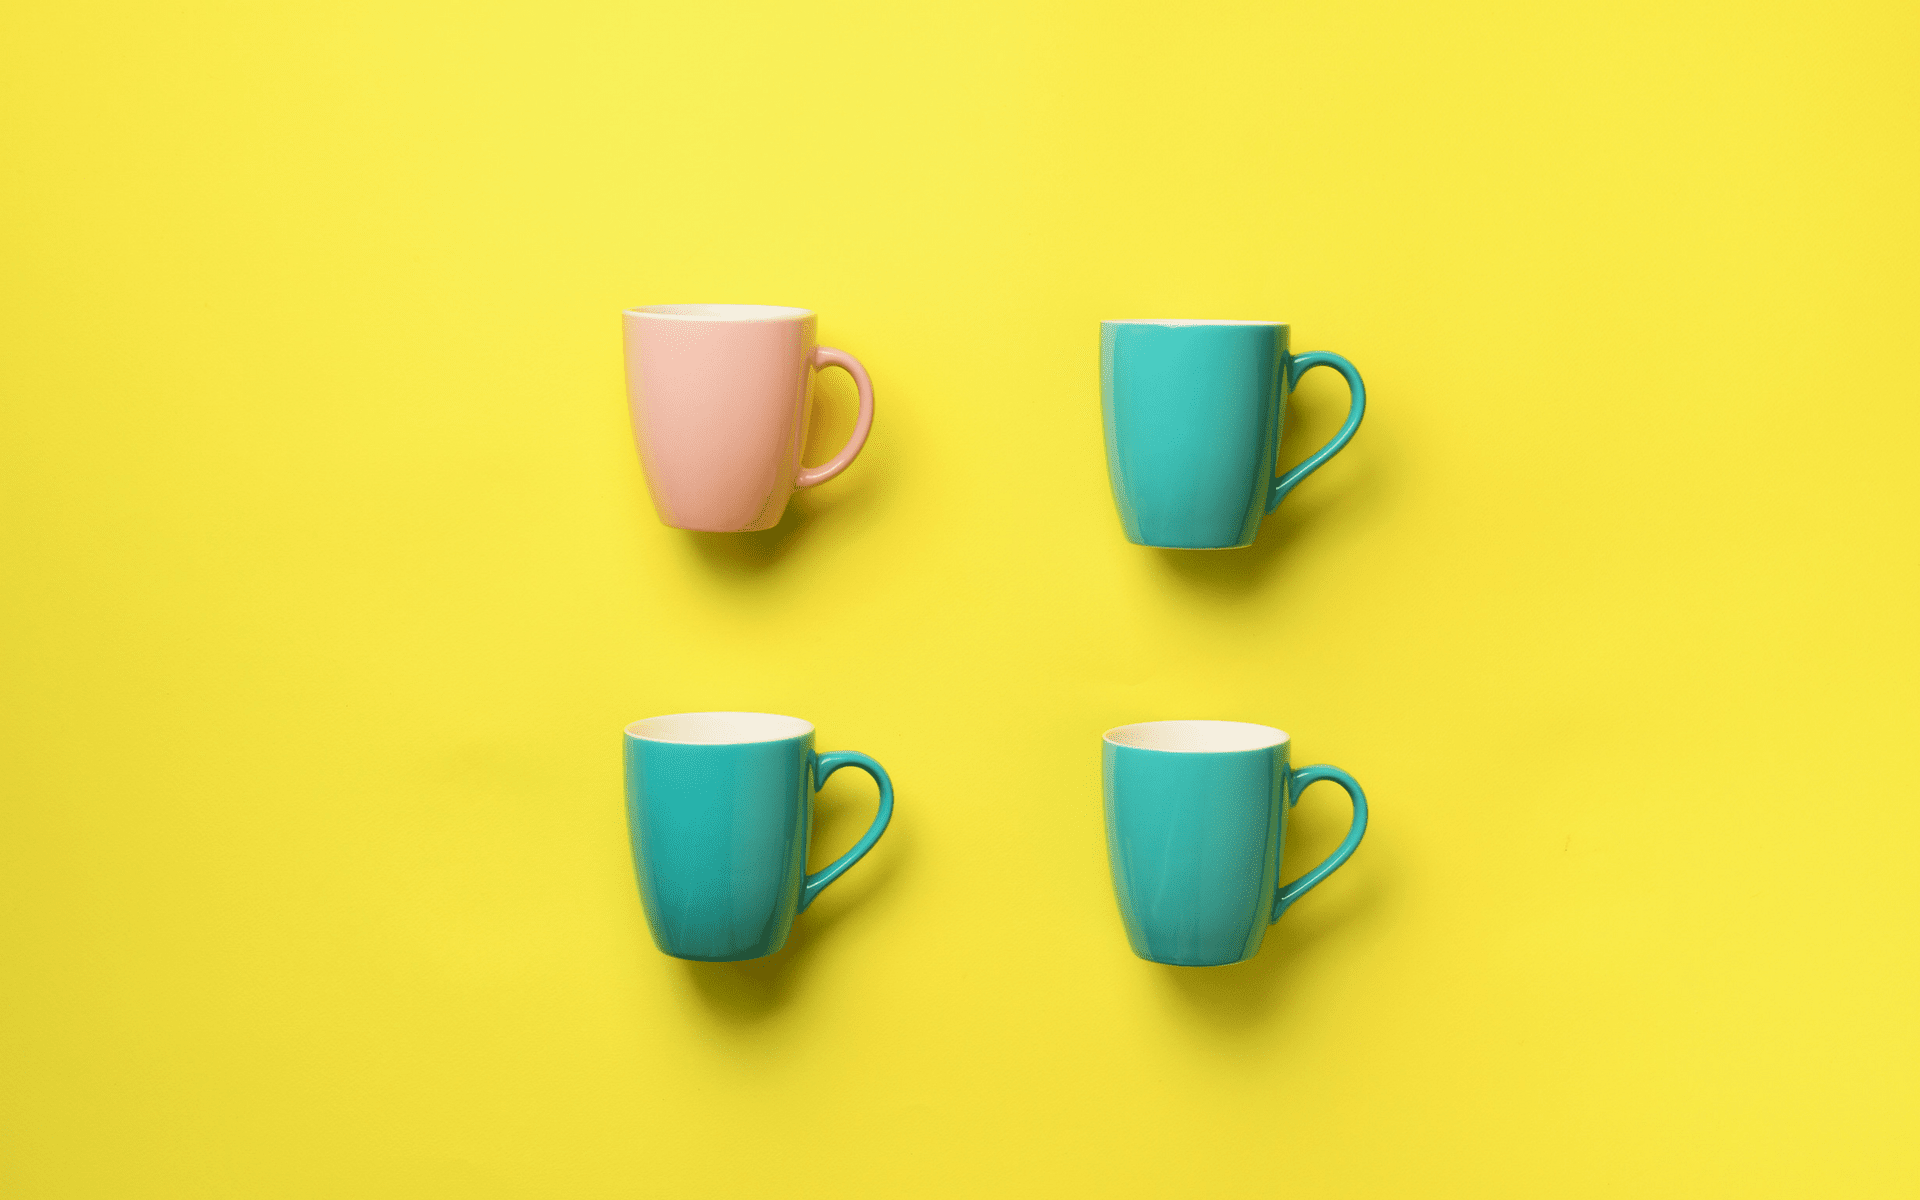 minimalisme-design-tendance